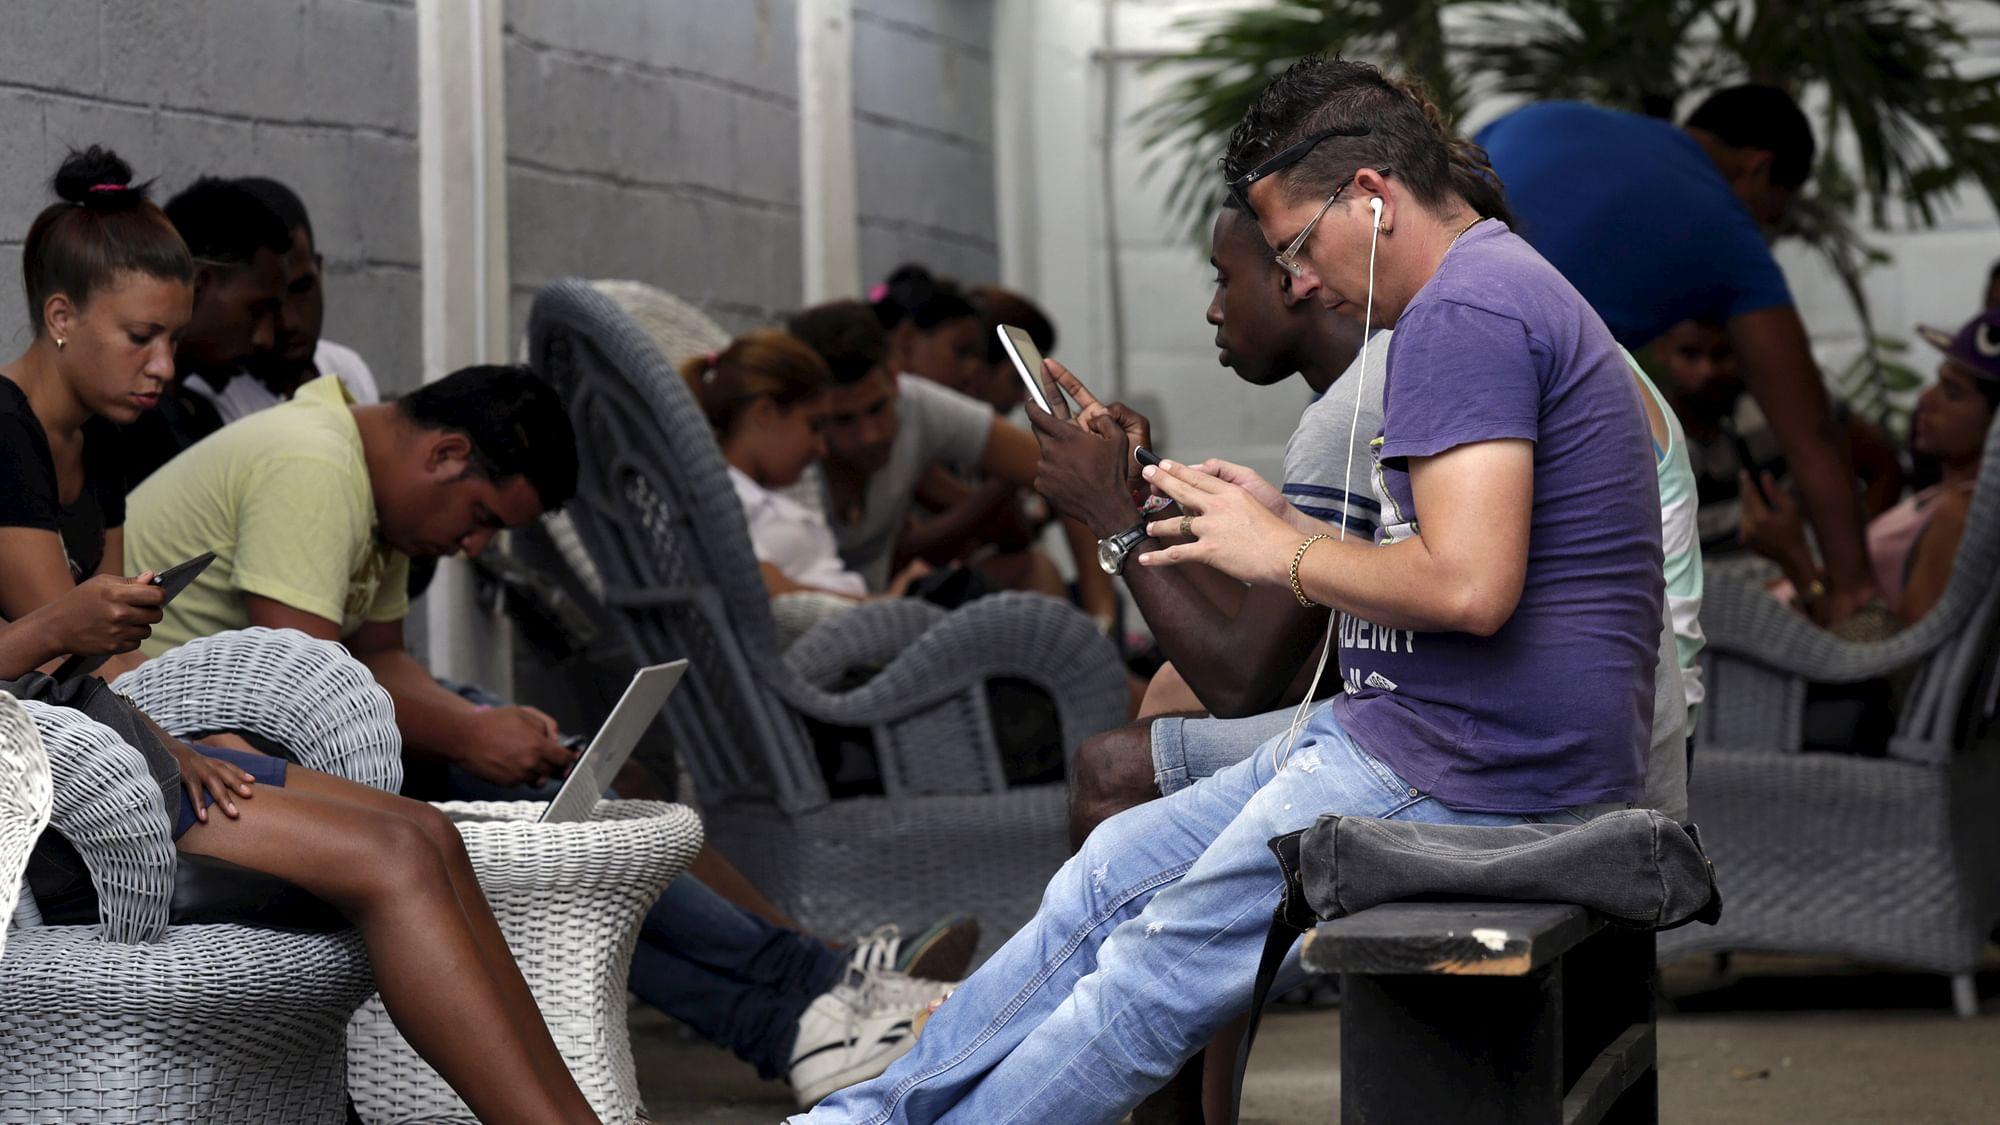 Delhi CM Promises Free WiFi; Gautam Gambhir Calls Him a 'Liar'